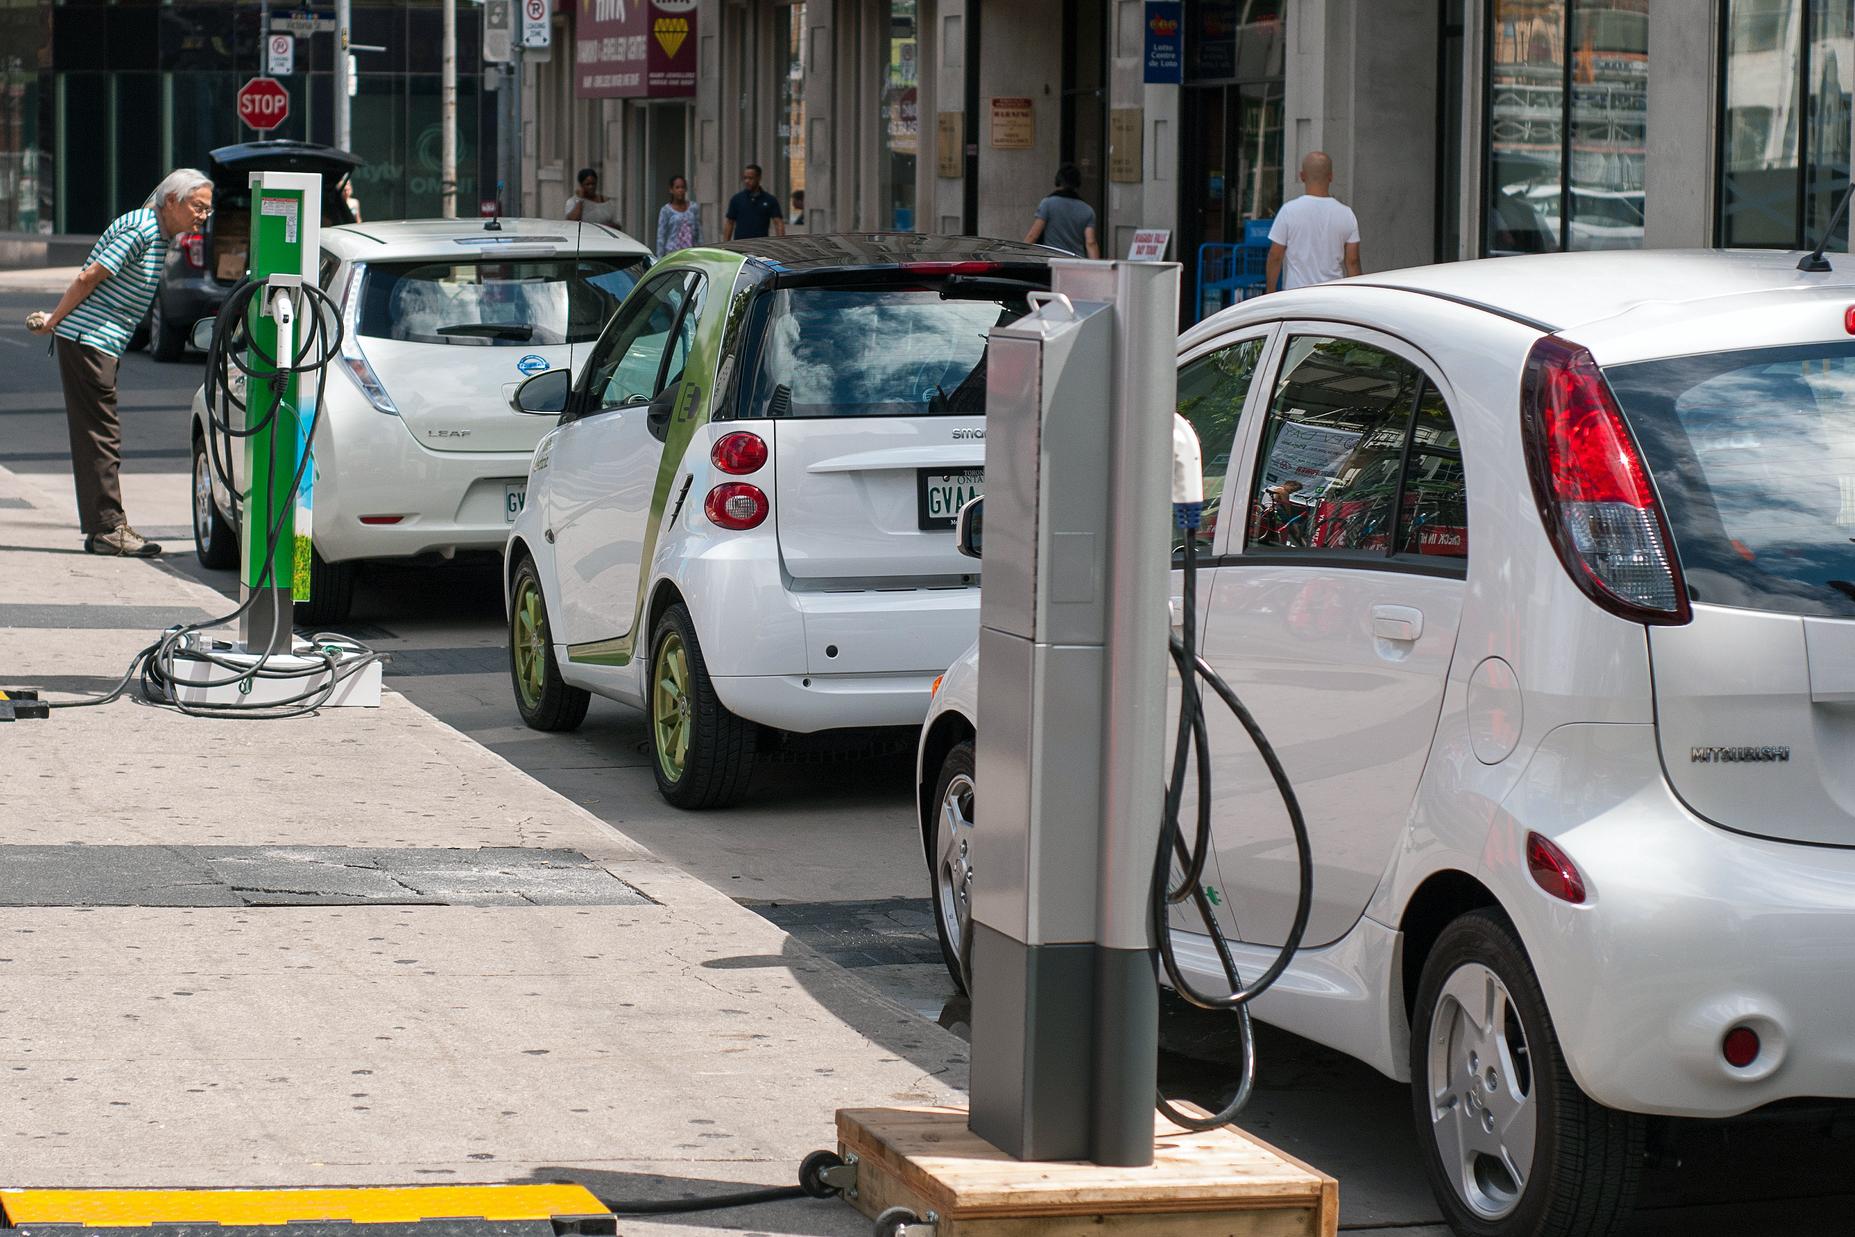 EU le apostará miles de millones de dólares a manufactura de vehículos eléctricos